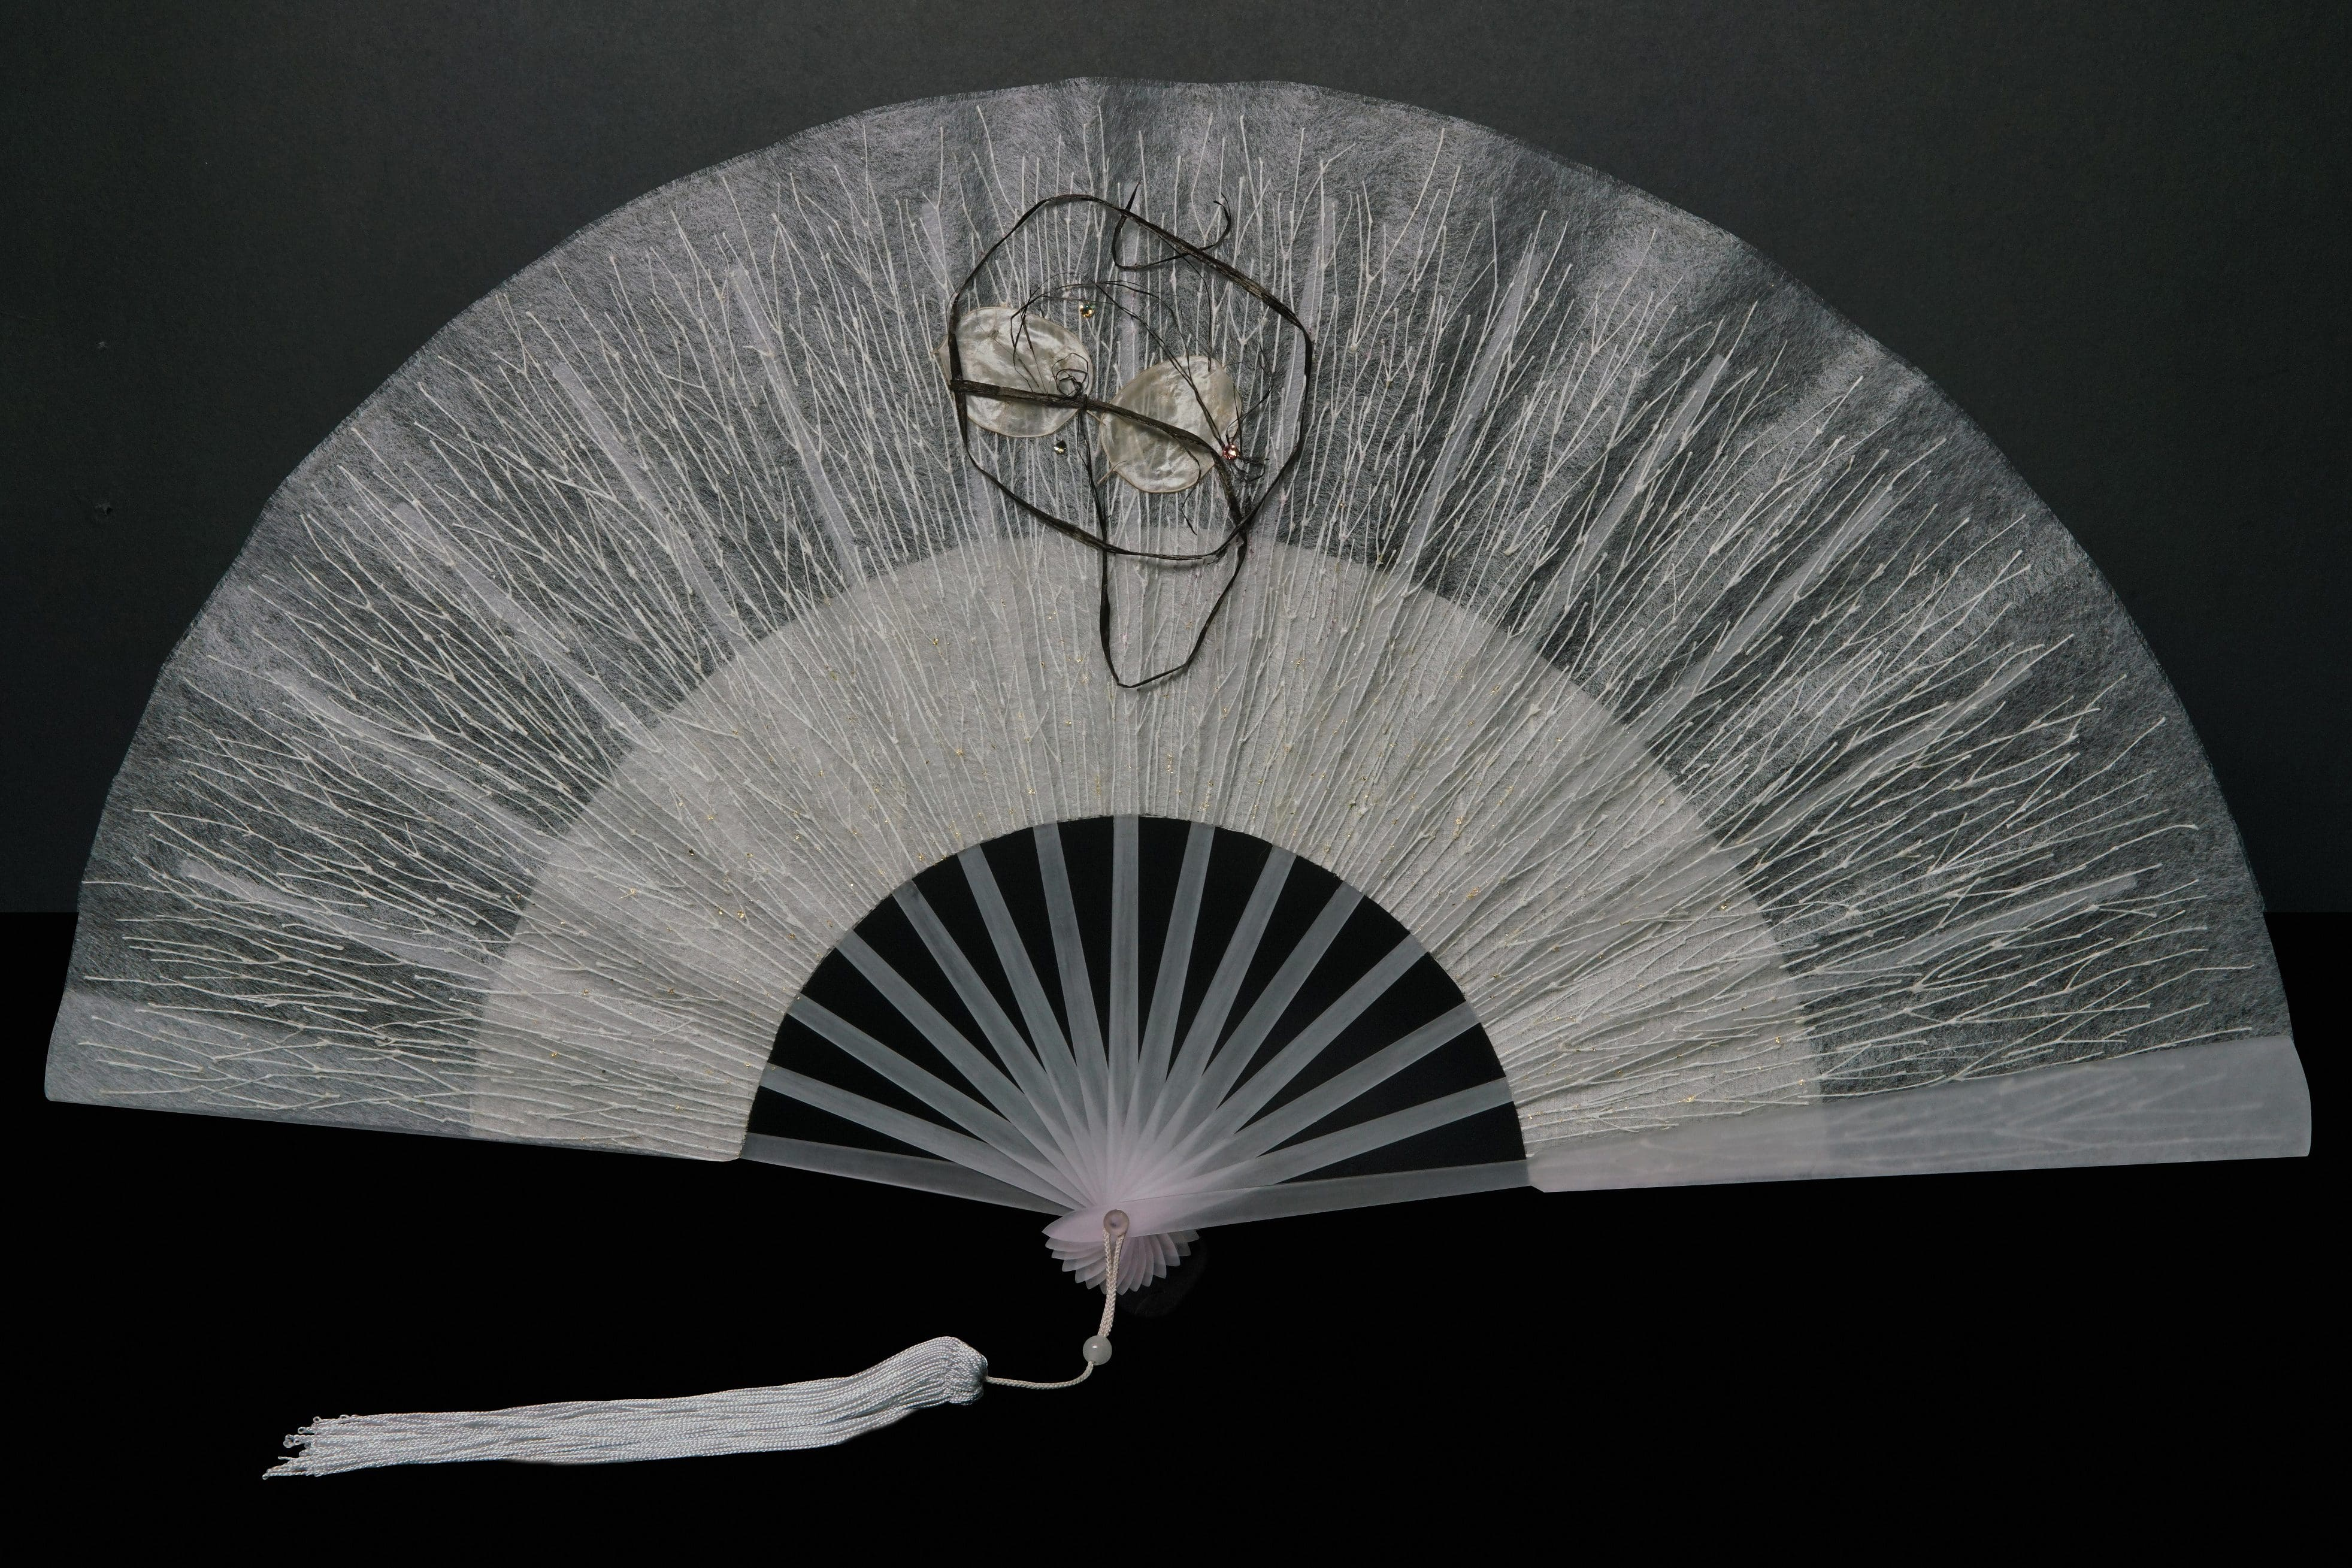 The specially designed silk and paper fan for Mandarin Oriental Wangfujing